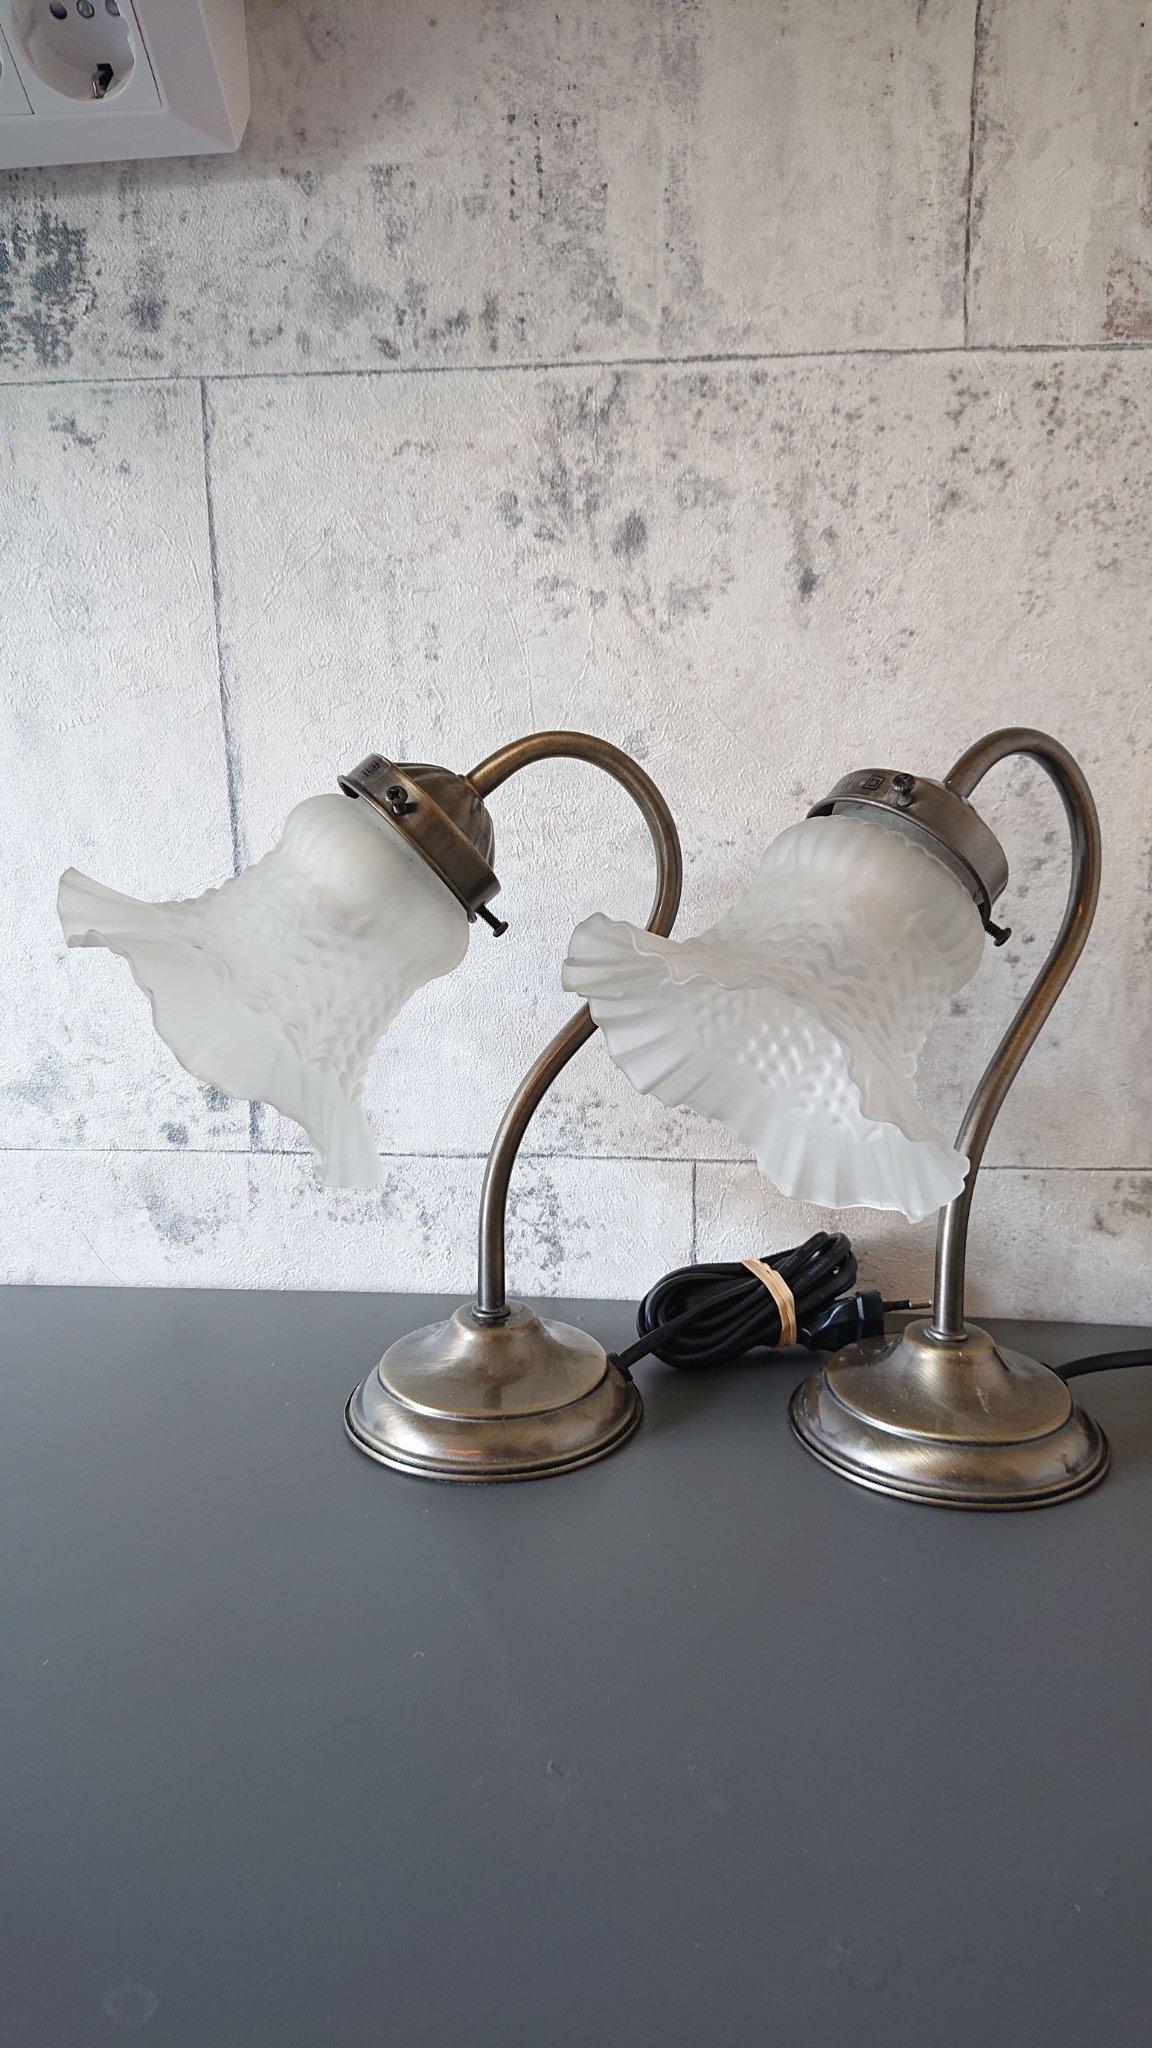 2 st. mini Bordslampor lampa fönsterlampa bordslampa